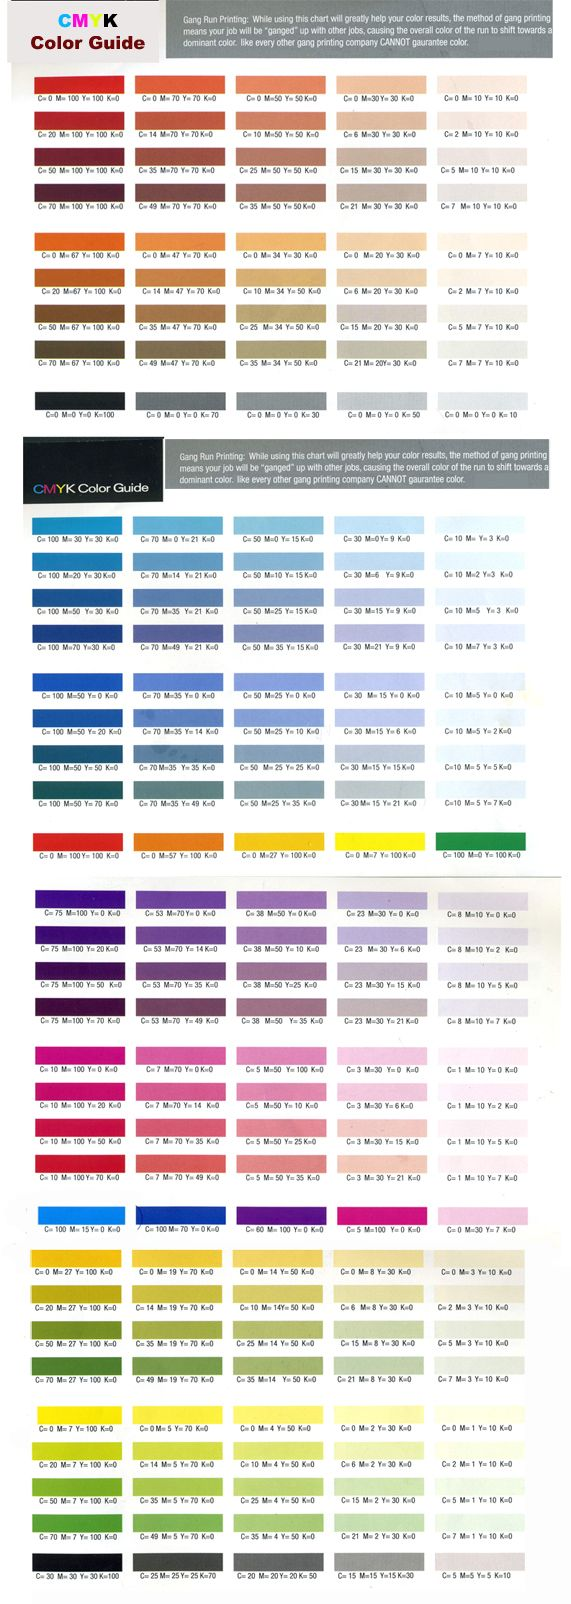 cmyk charts 100 dpi jpg..jpg 571×1,604 pixels